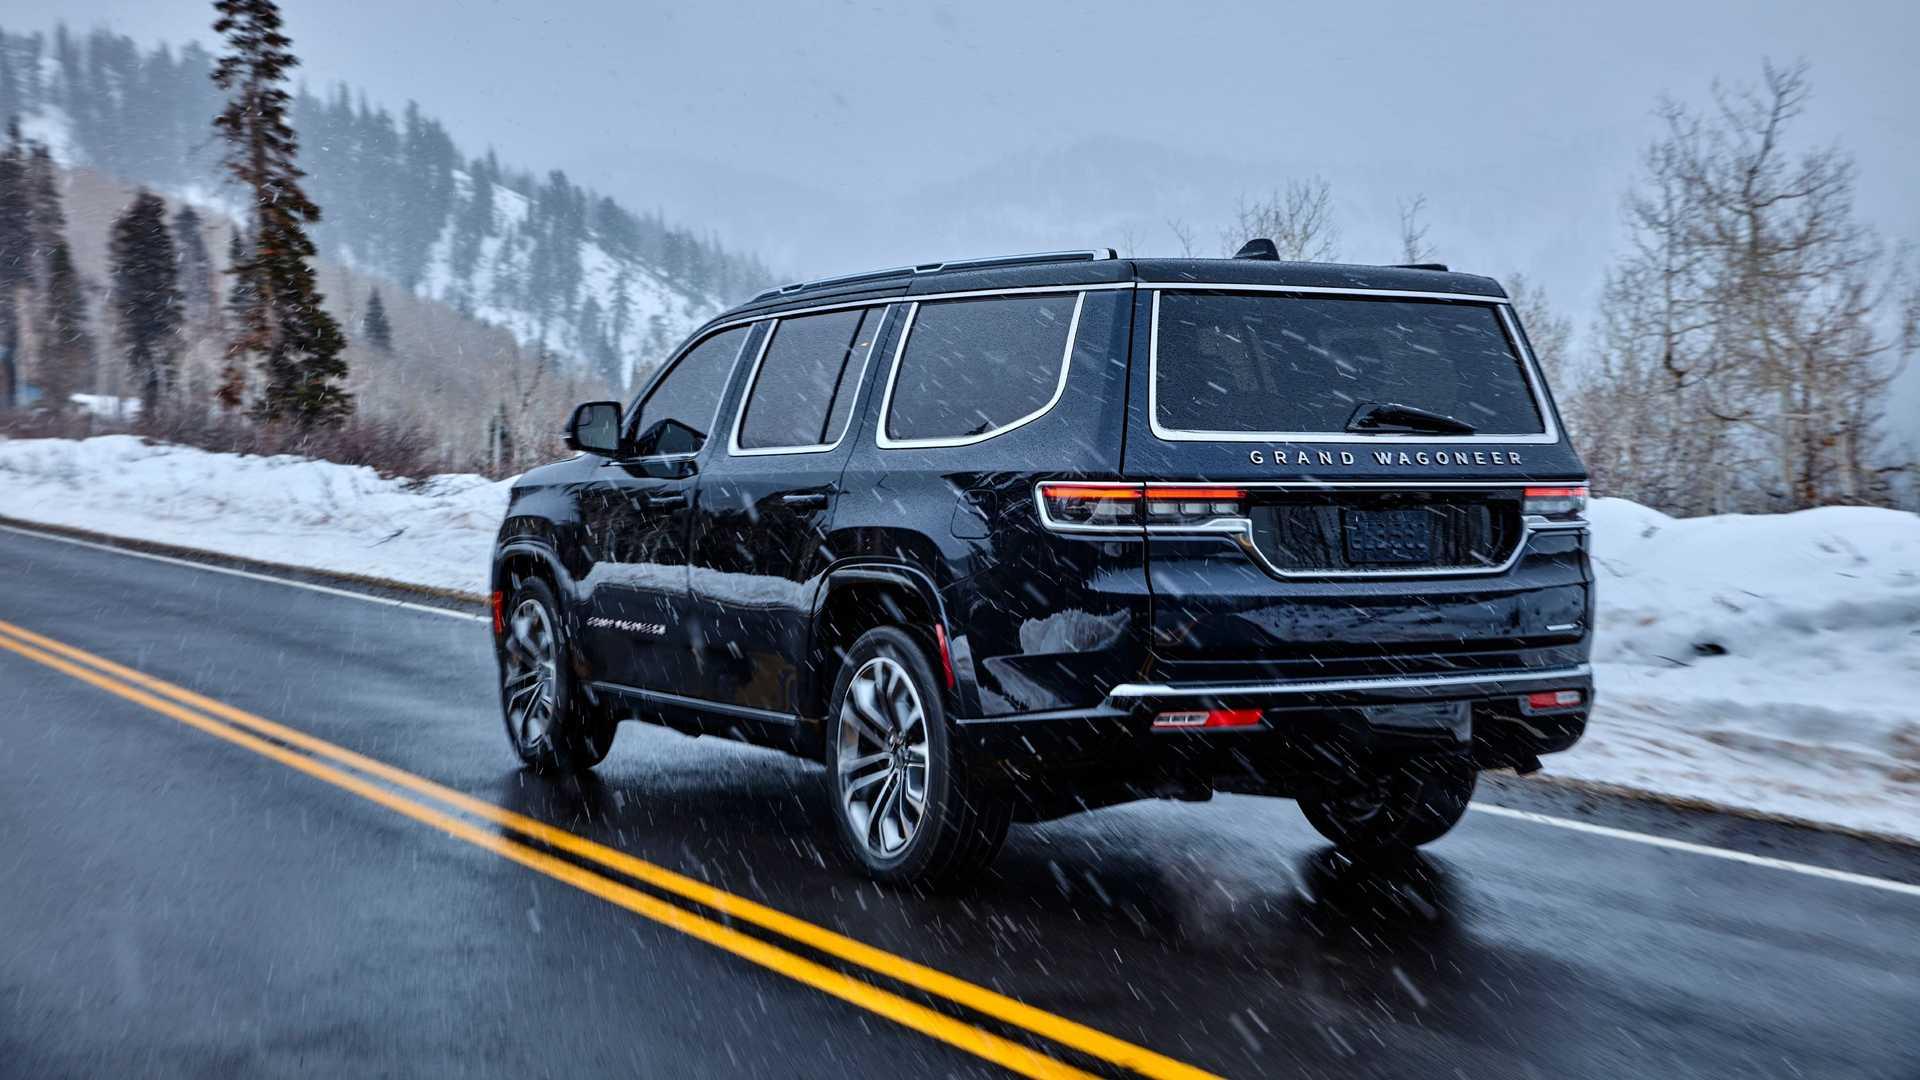 2022-jeep-grand-wagoneer-exterior-rear-quarter-8